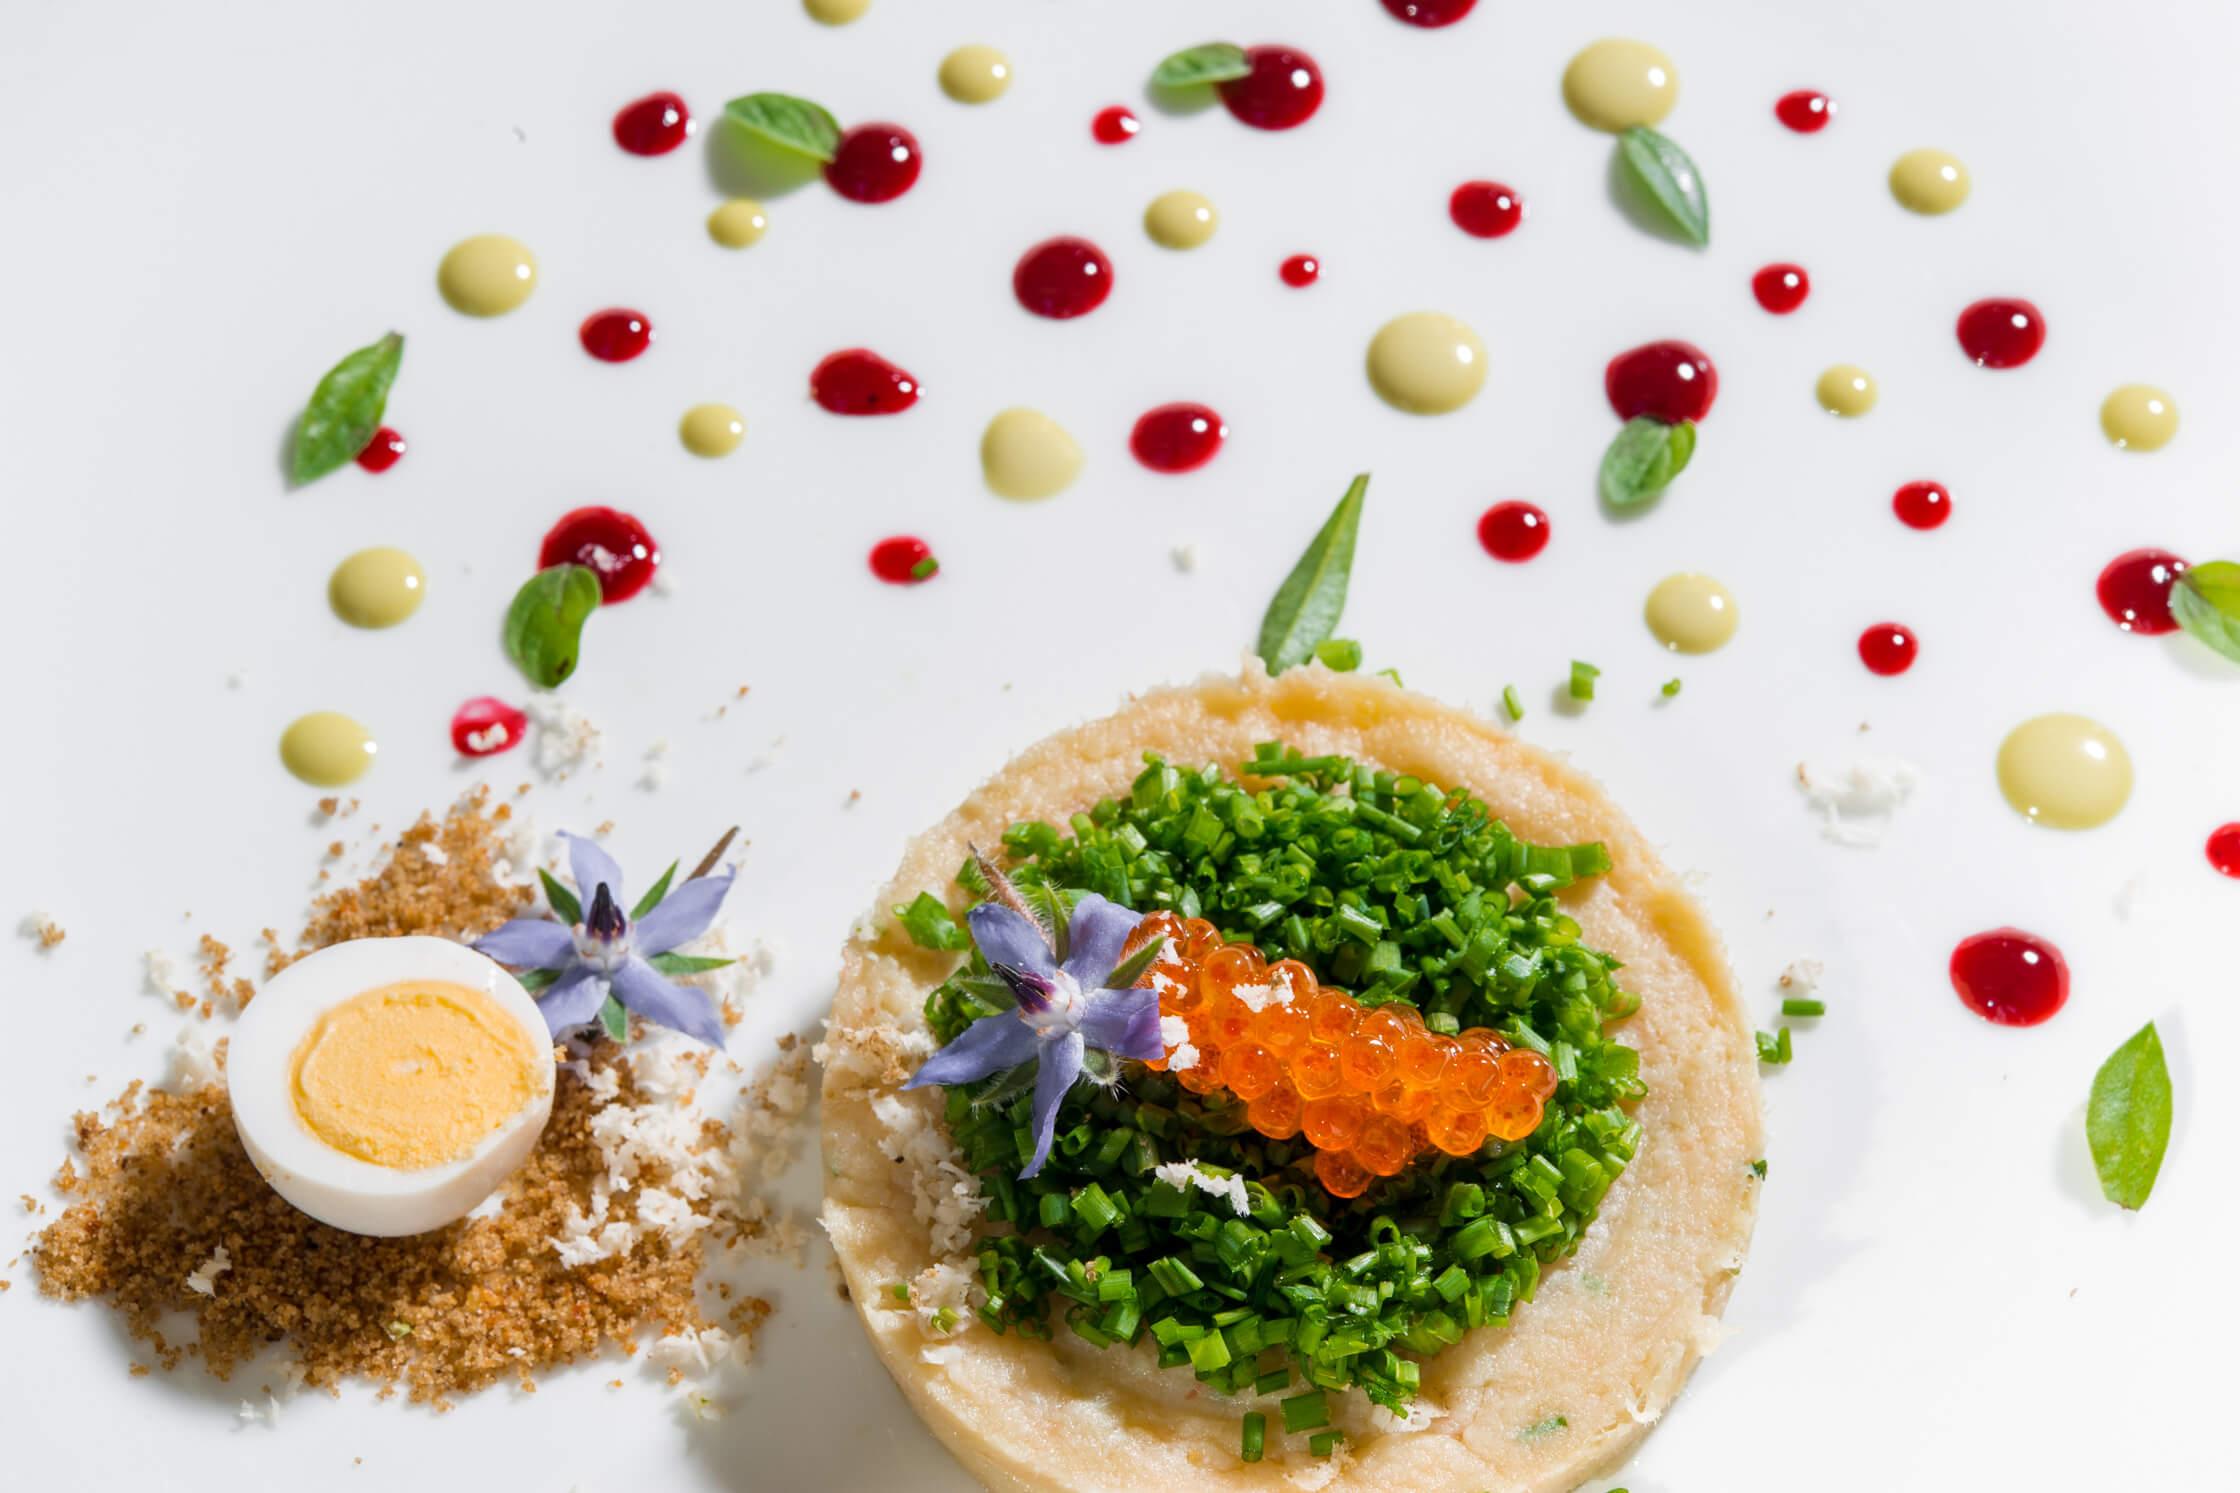 Pomurje Region - Future food